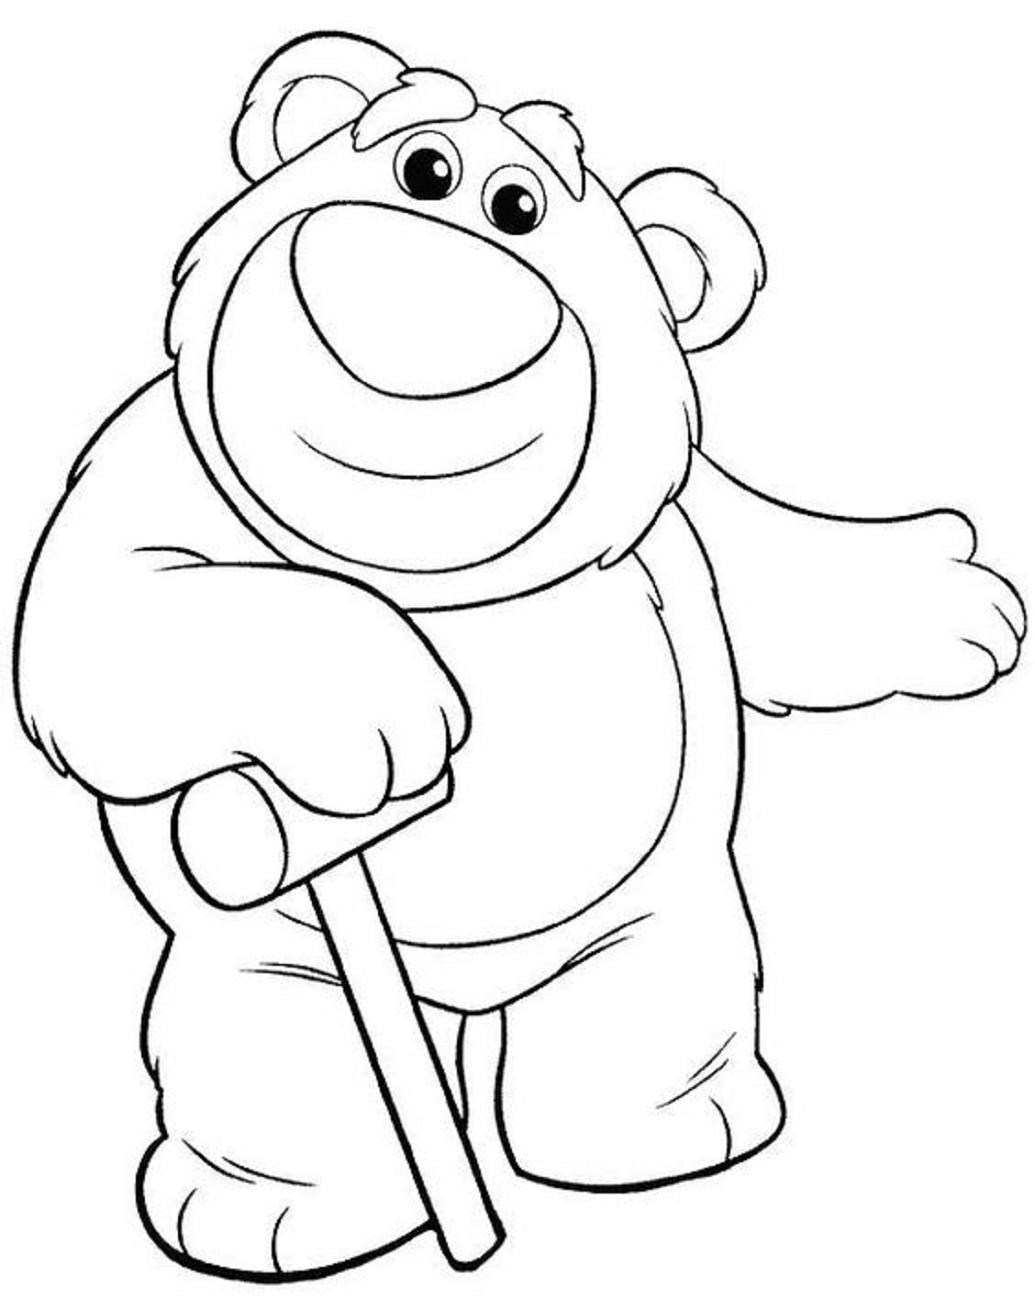 Dibujos De Losto Toy Story 3 Para Colorear Pintar E